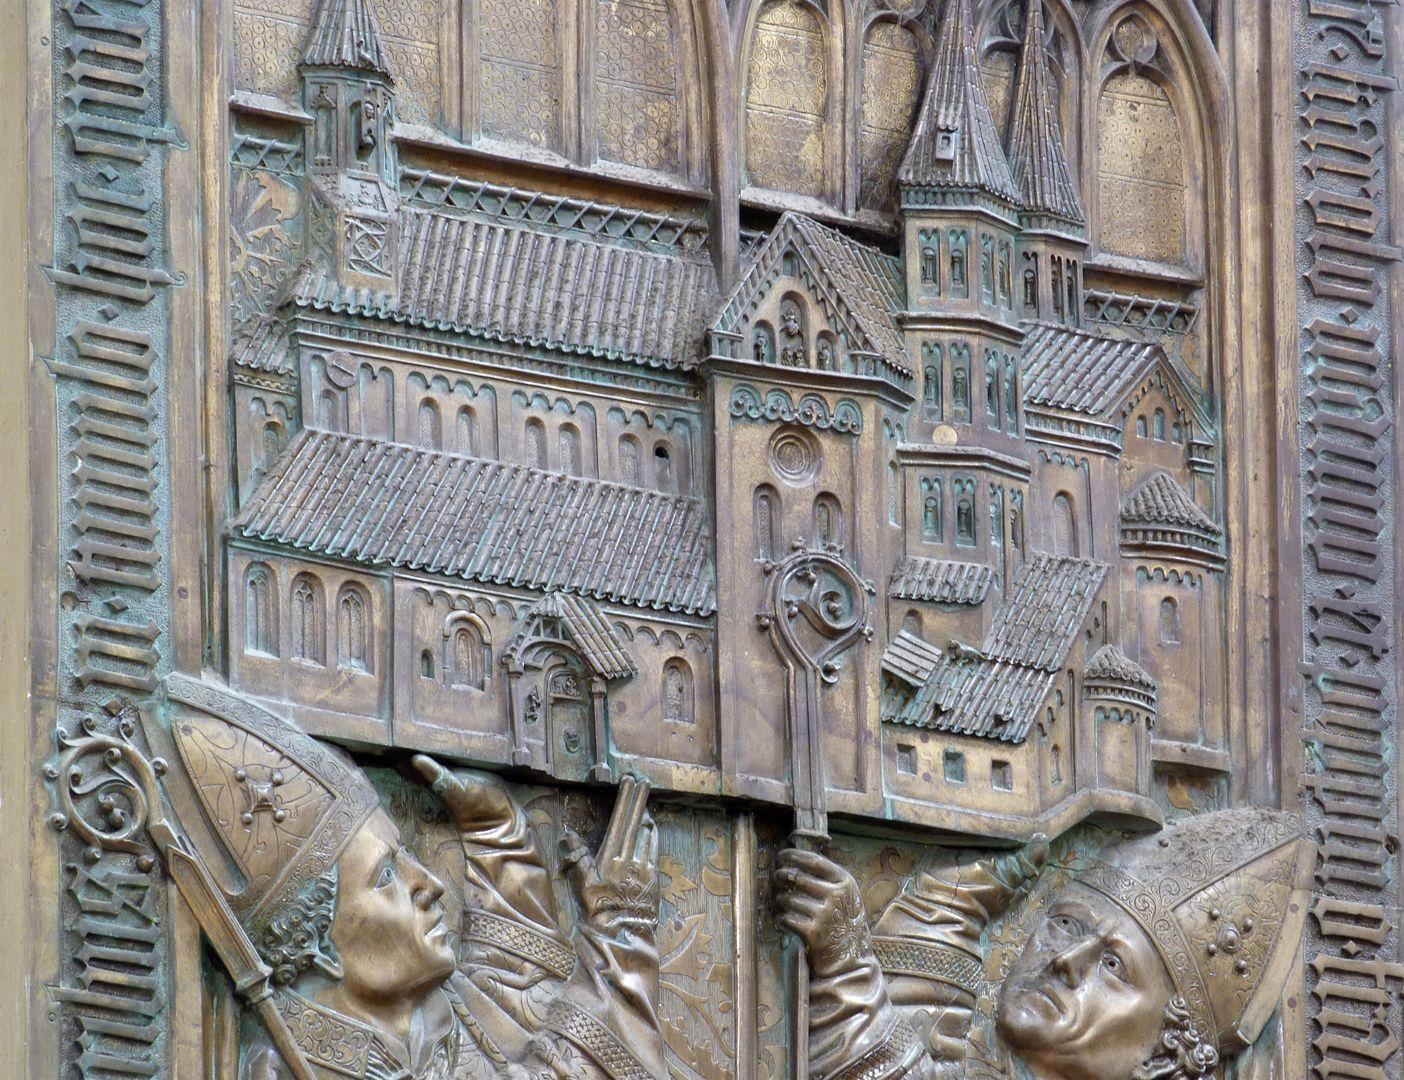 Memorial panel for Hariolf and Erlolf Kirchenmodell, Schrägansicht